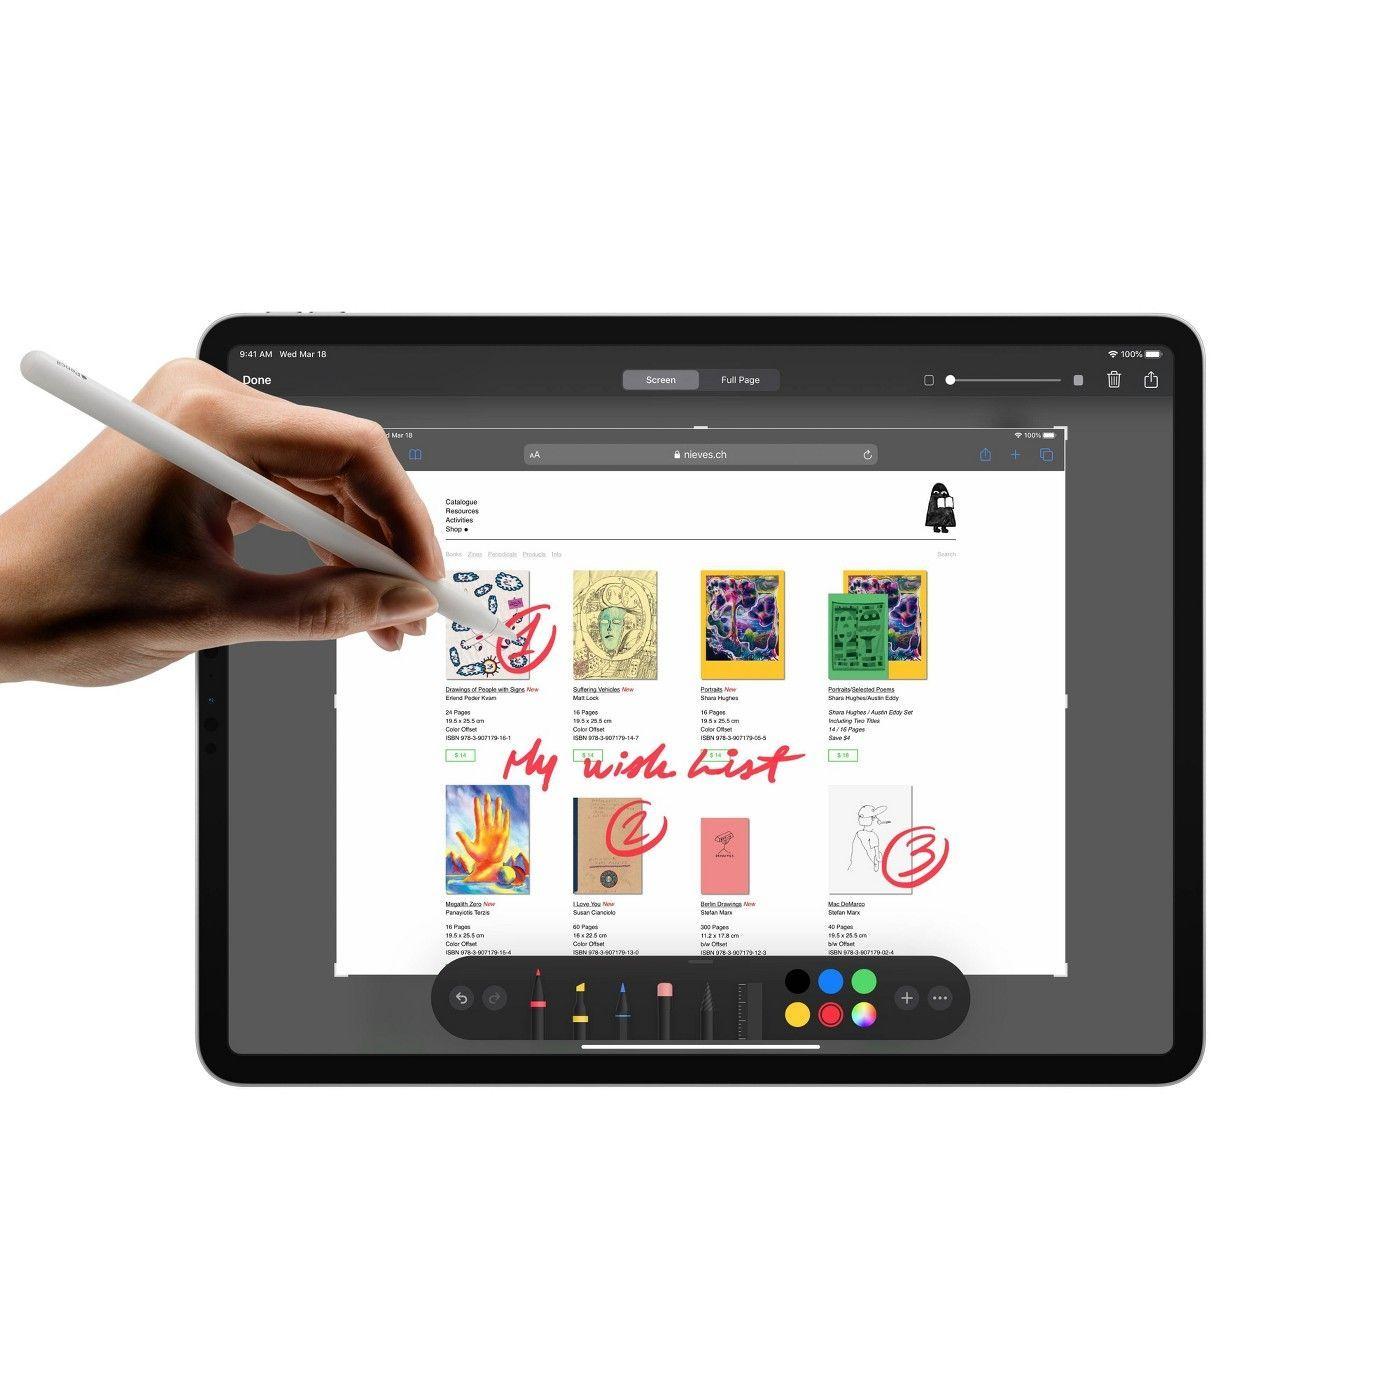 Apple Ipad Pro 11 Inch Wi Fi Only 2020 Model Sponsored Pro Affiliate Apple Ipad In 2020 Apple Ipad Apple Ipad Pro Ipad Pro